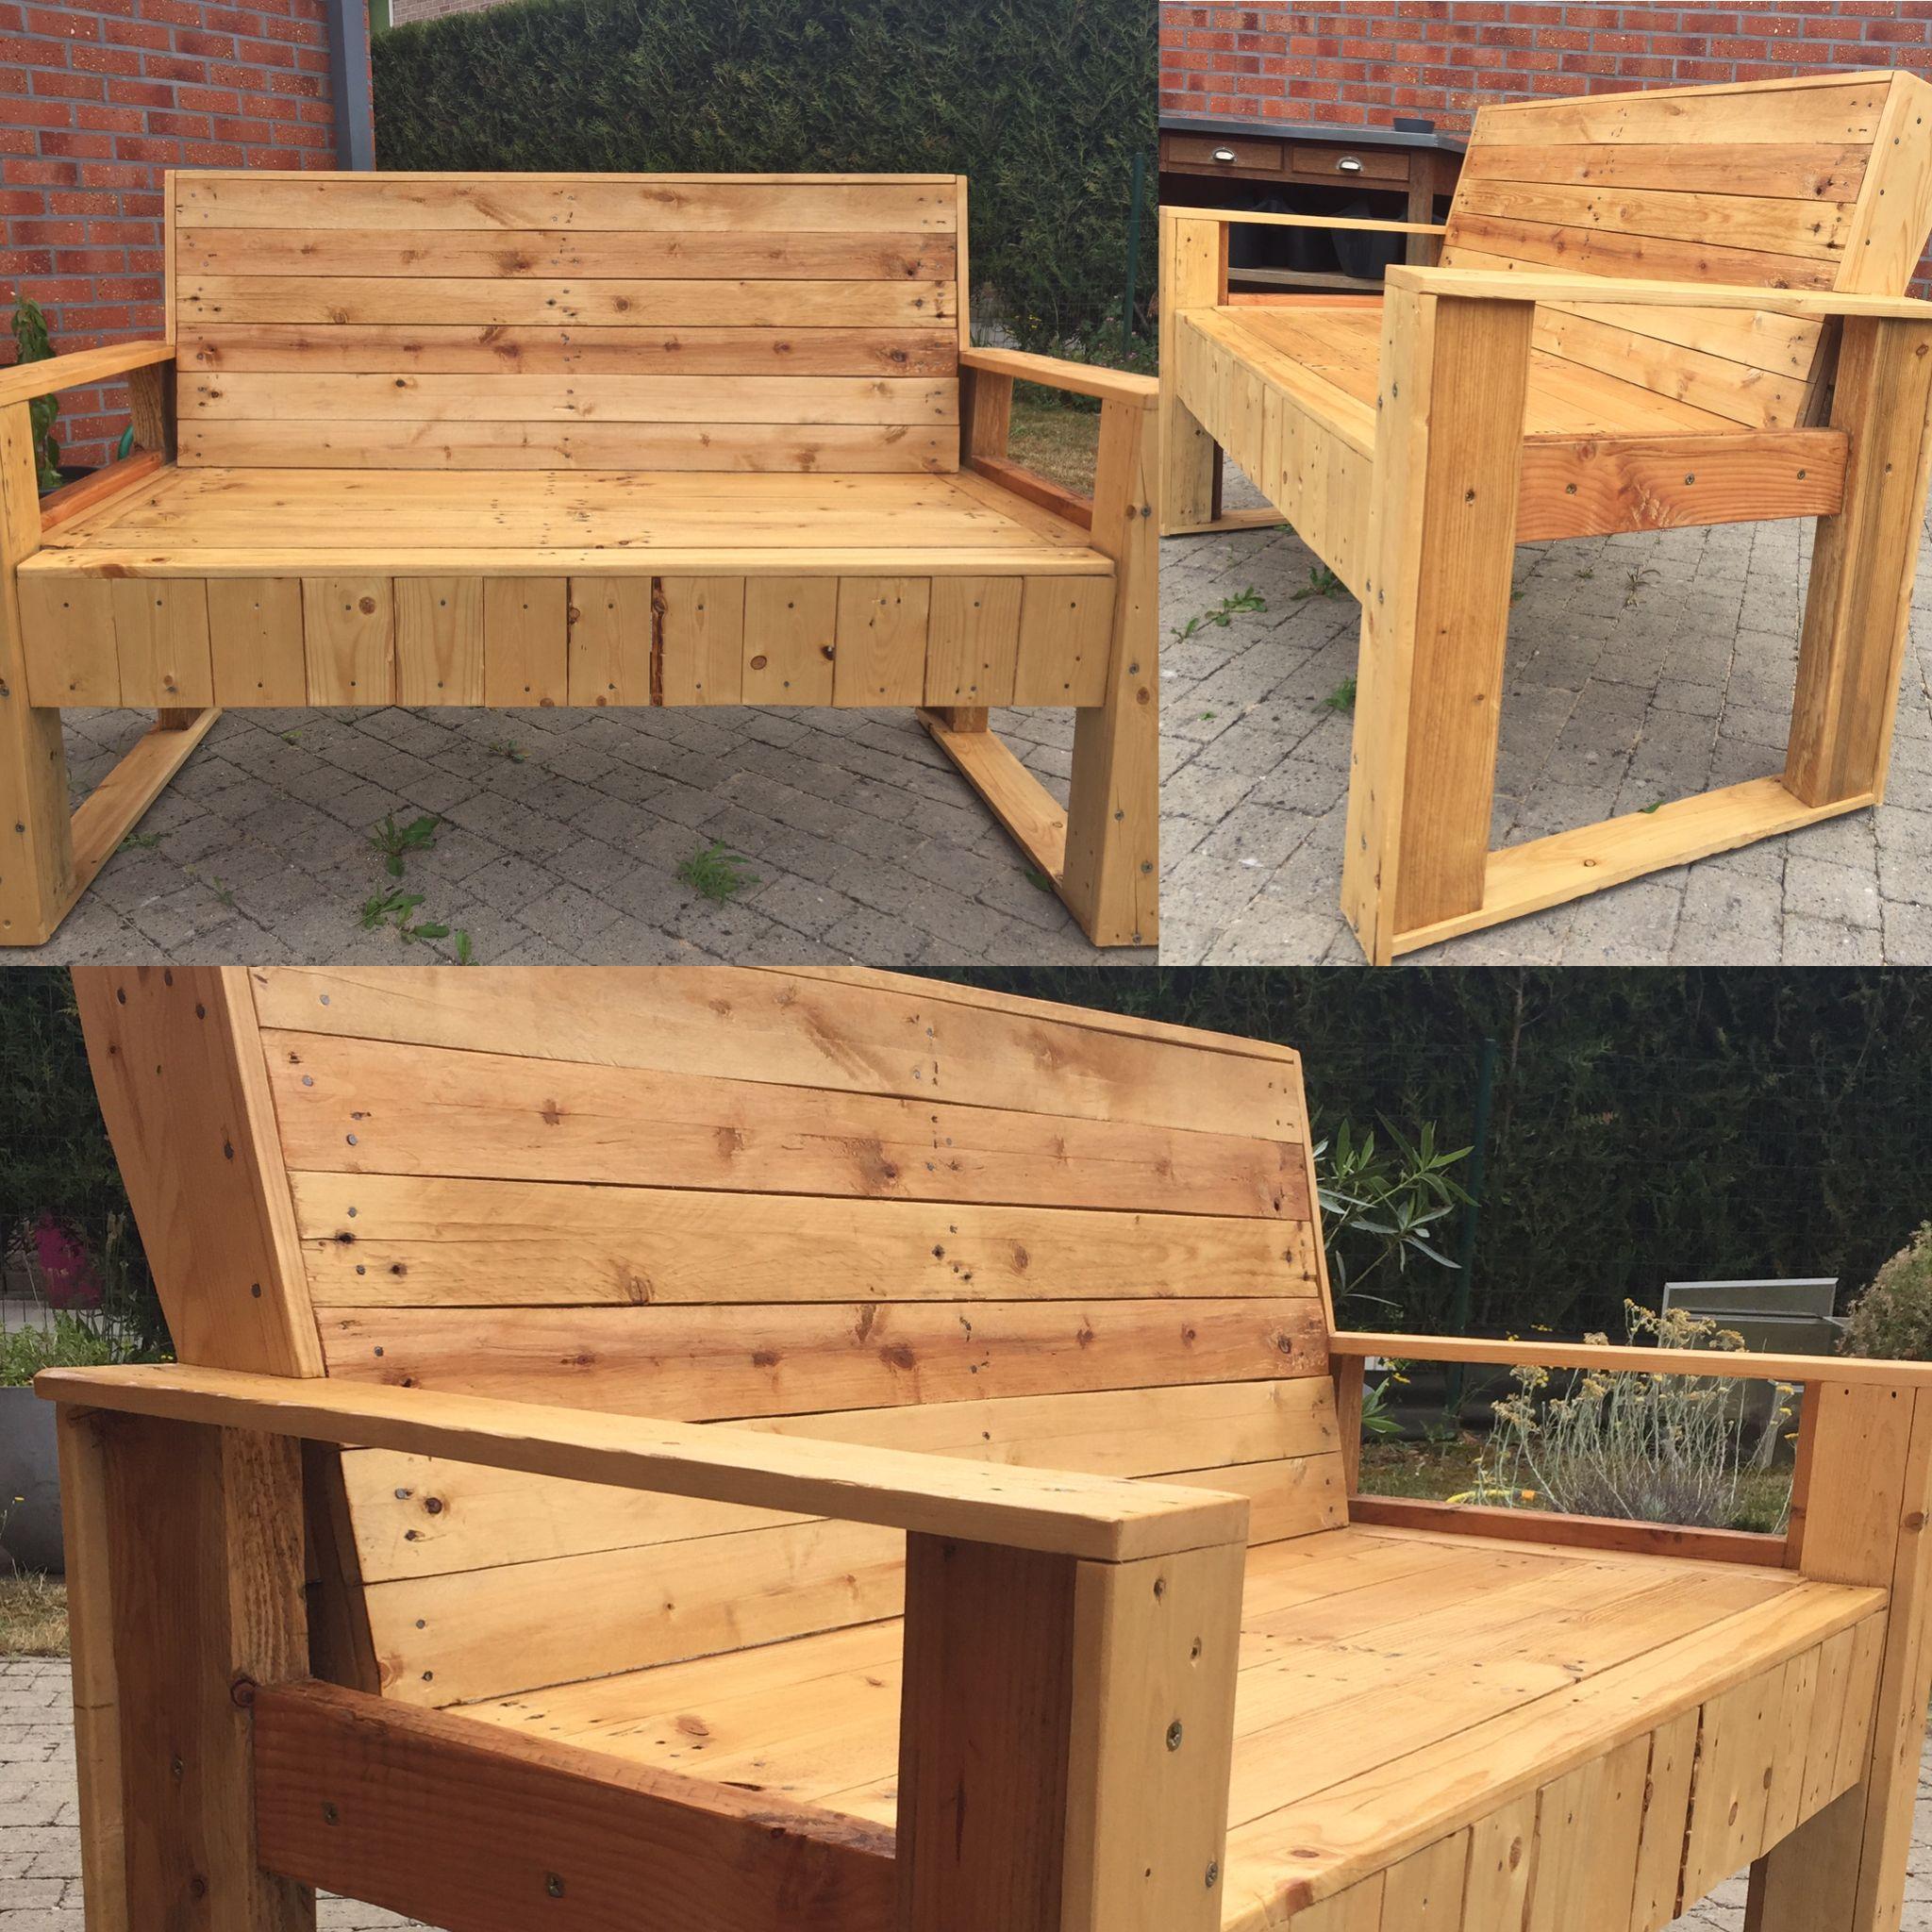 Banc en palette - Inspiration - geometric - DIY - Wood - Bois brut ...